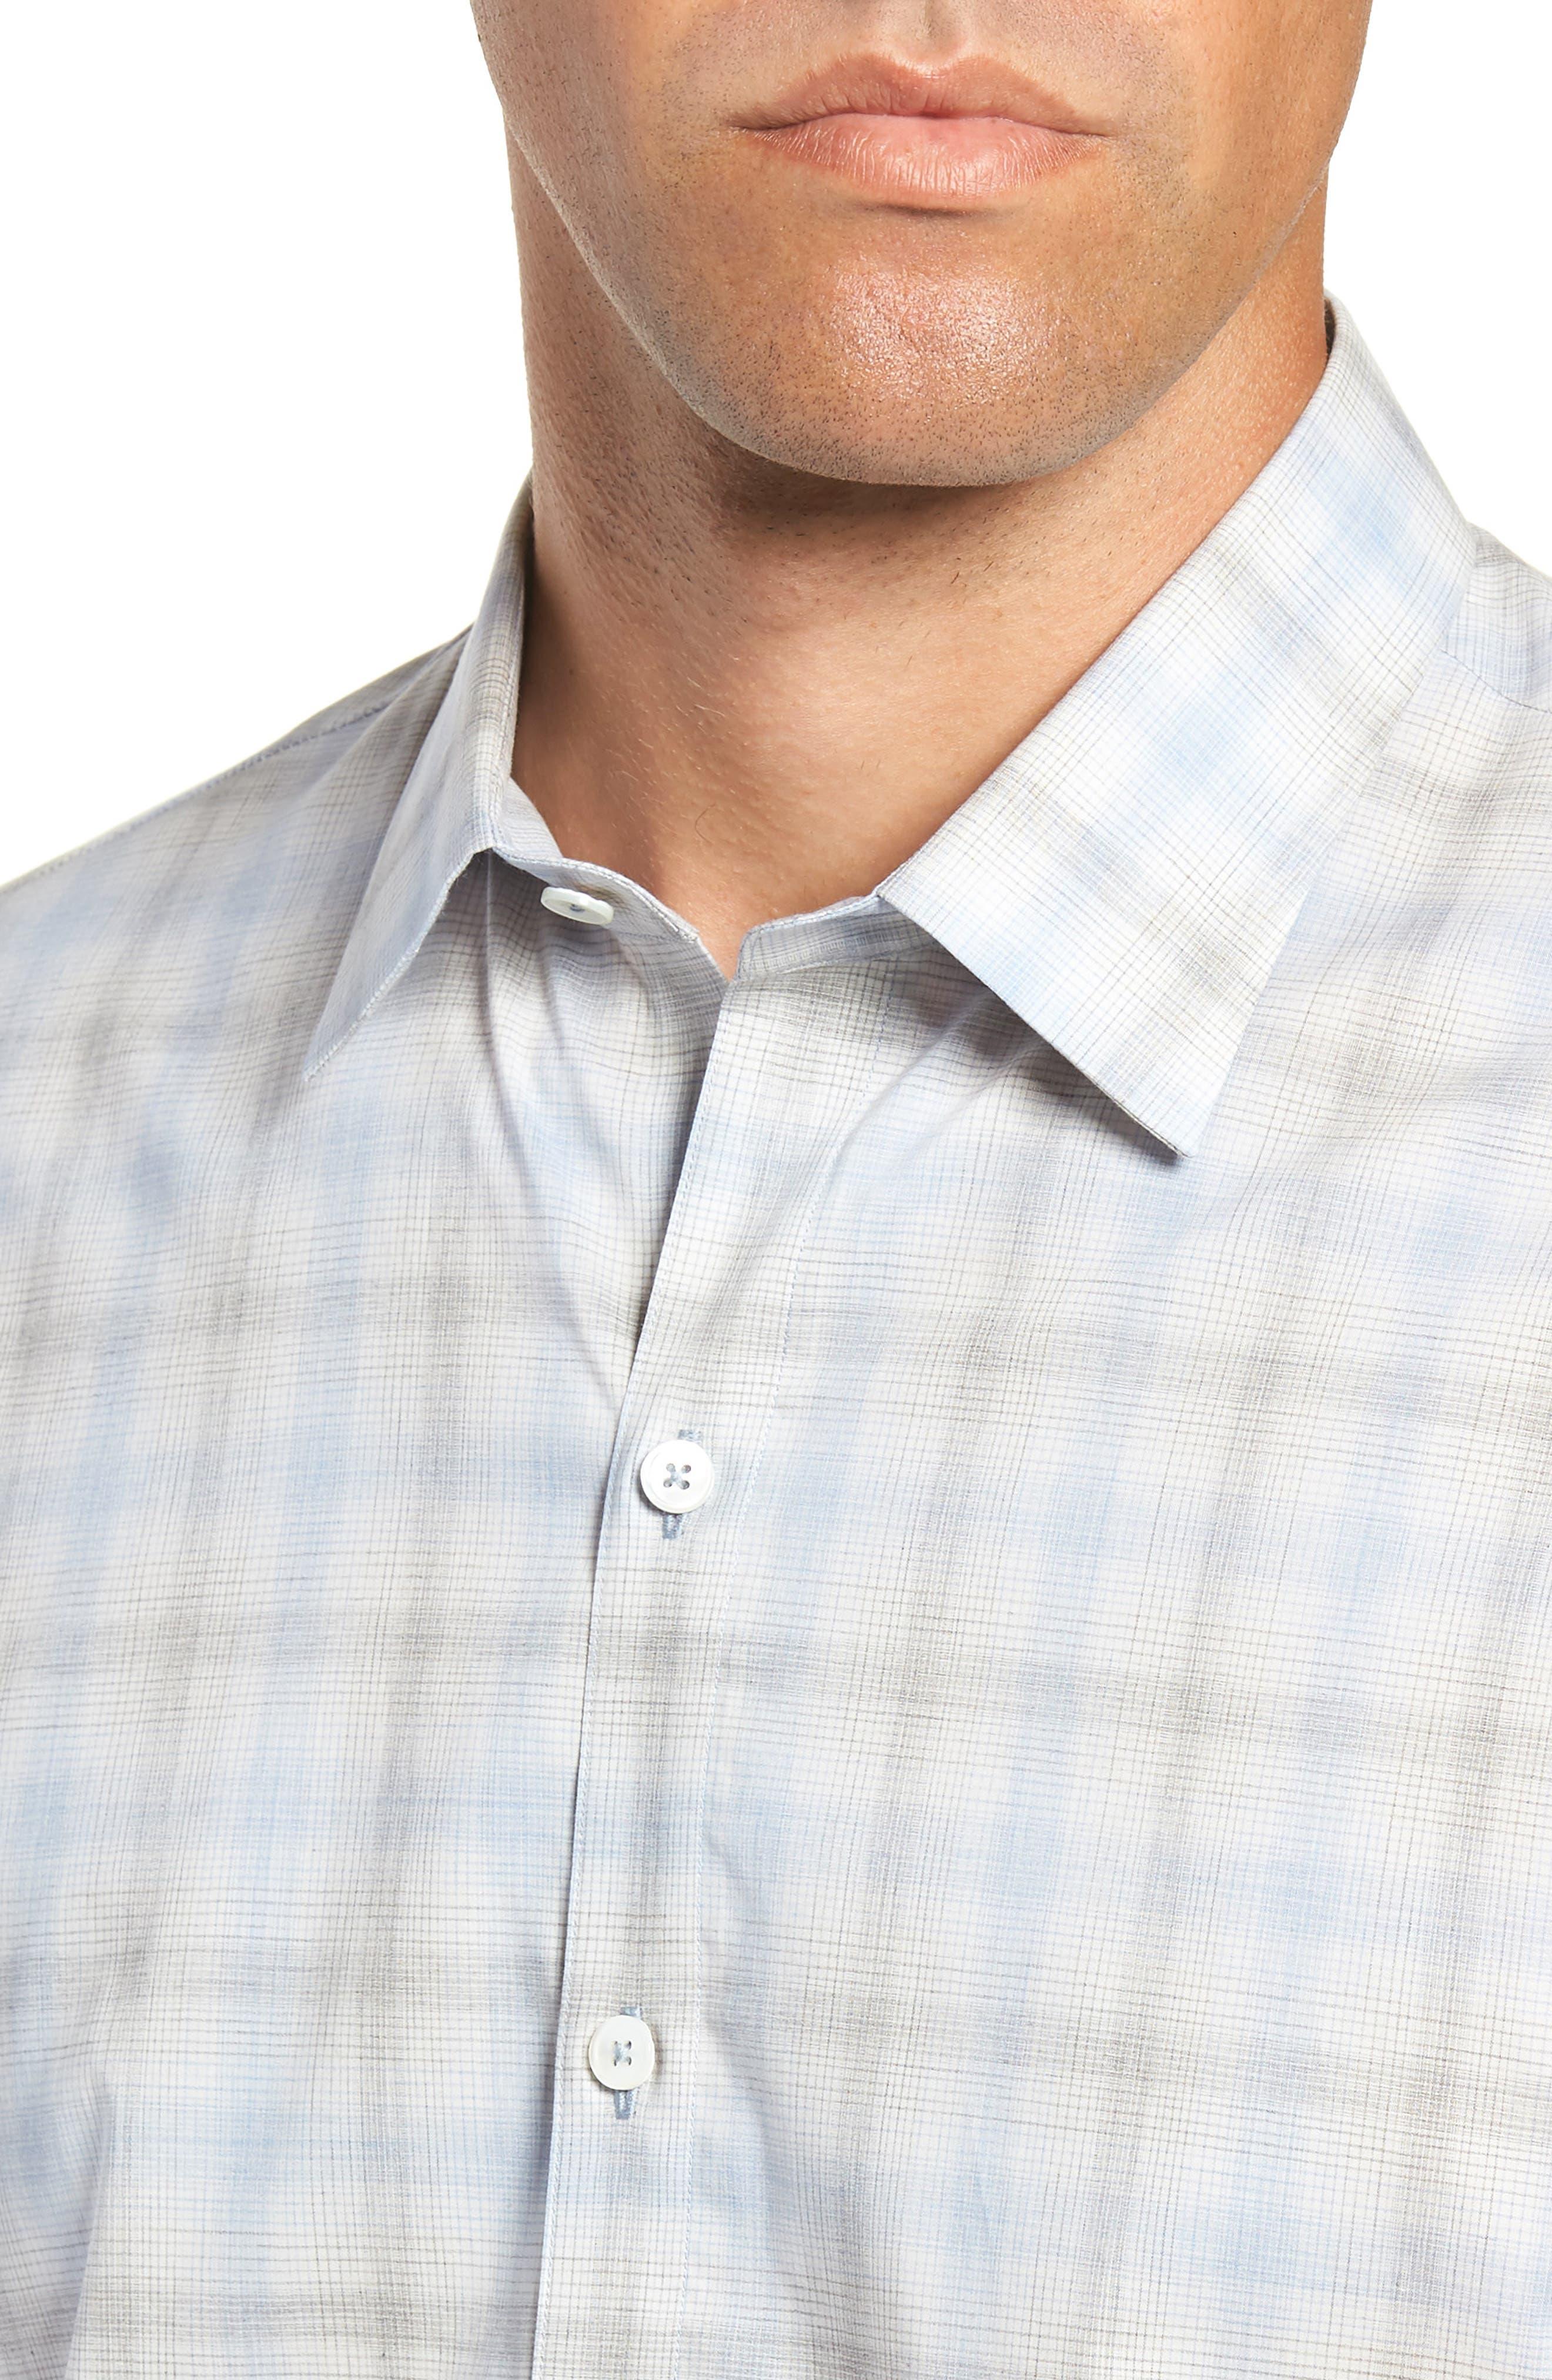 Mourad Regular Fit Sport Shirt,                             Alternate thumbnail 2, color,                             LIGHT GREY